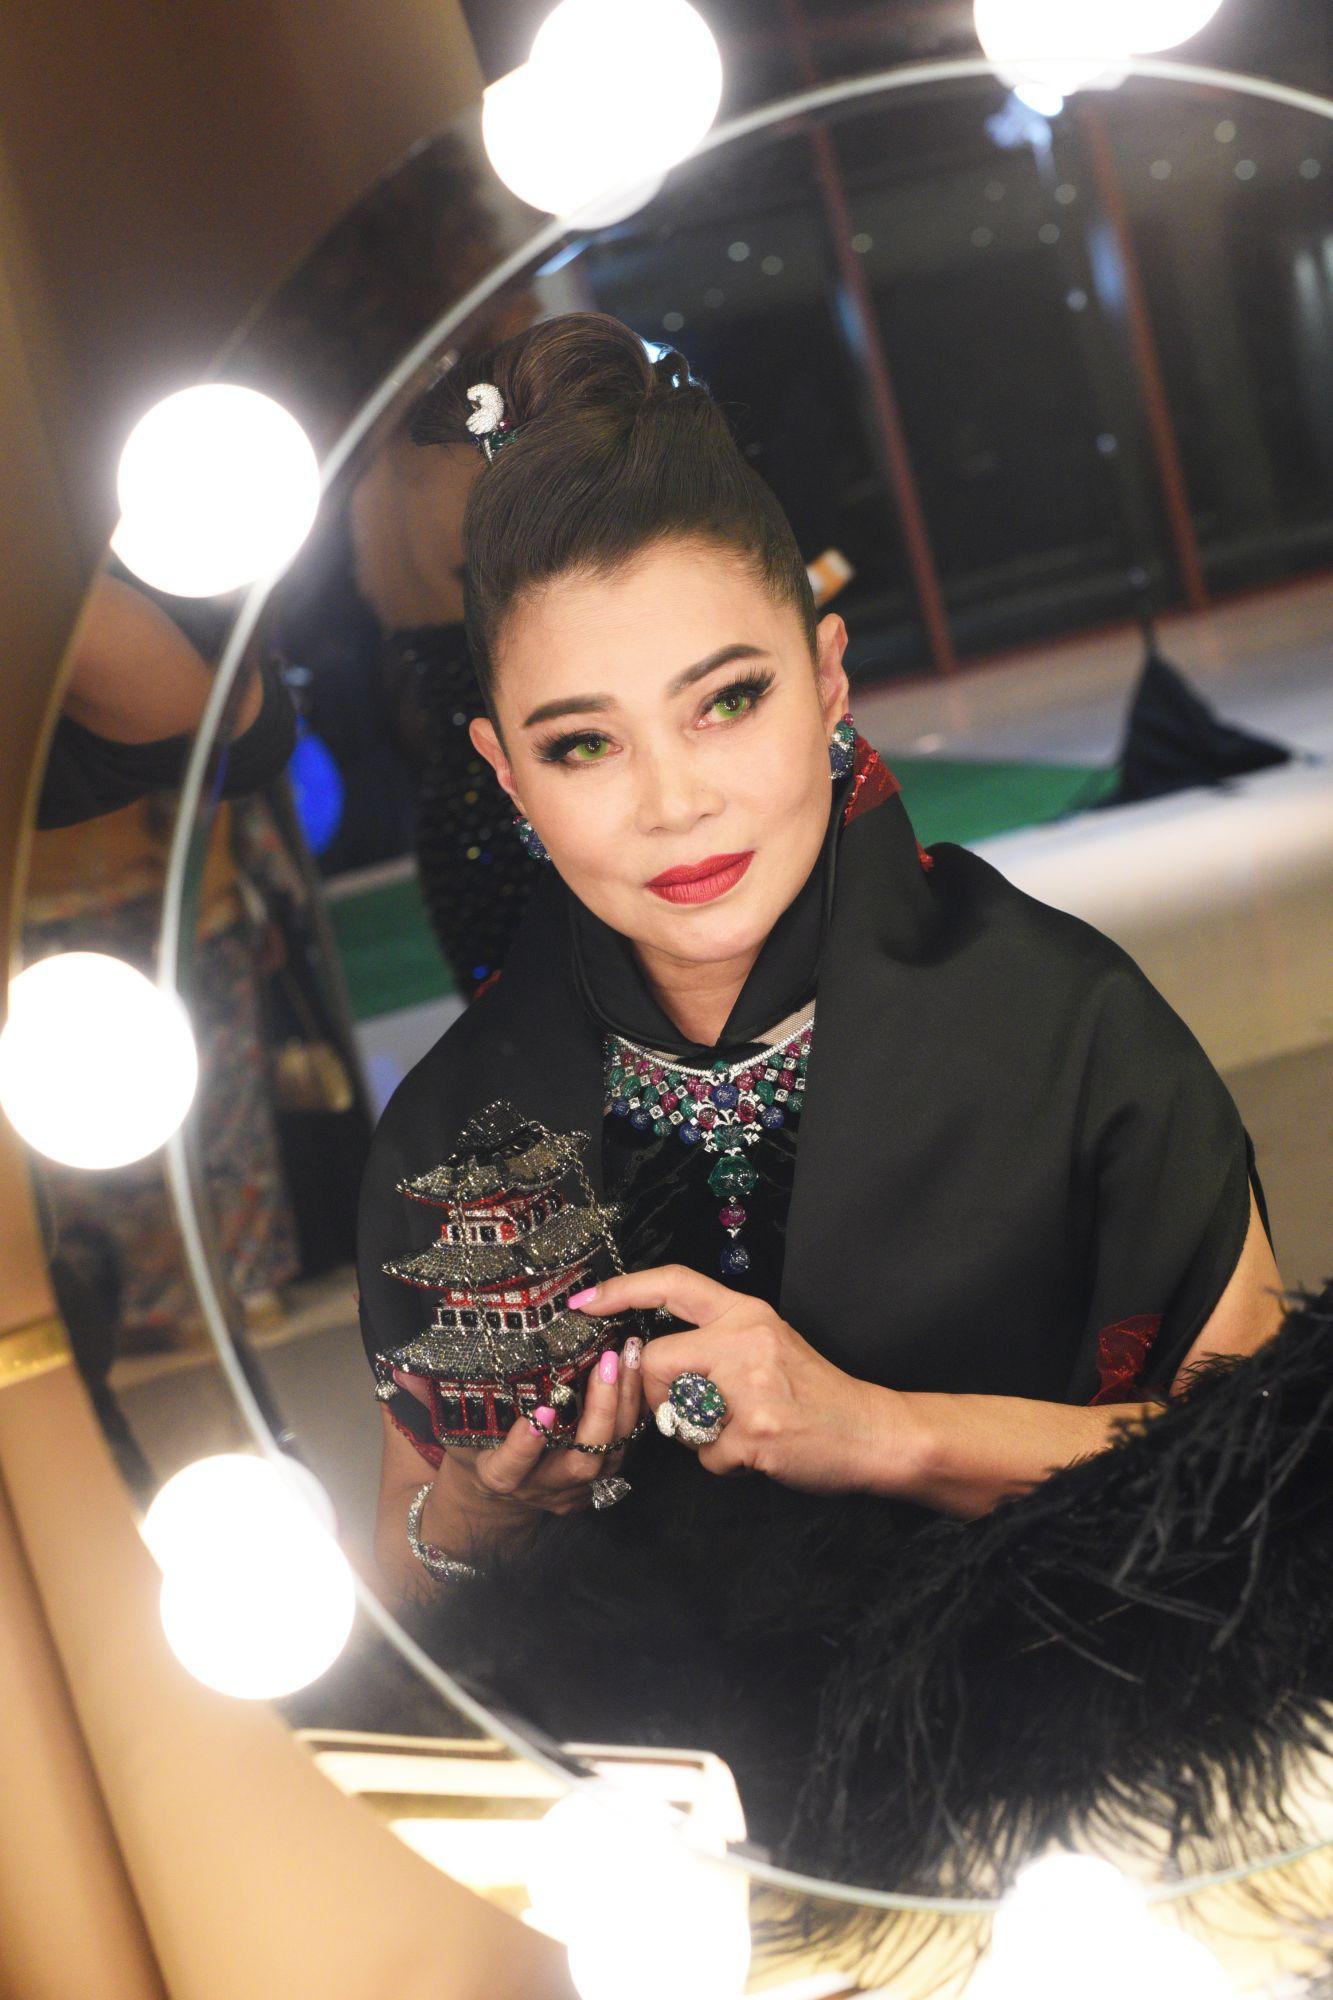 Singapore Tatler Ball 2019: The Fashion! The Drama! The Style Standouts!